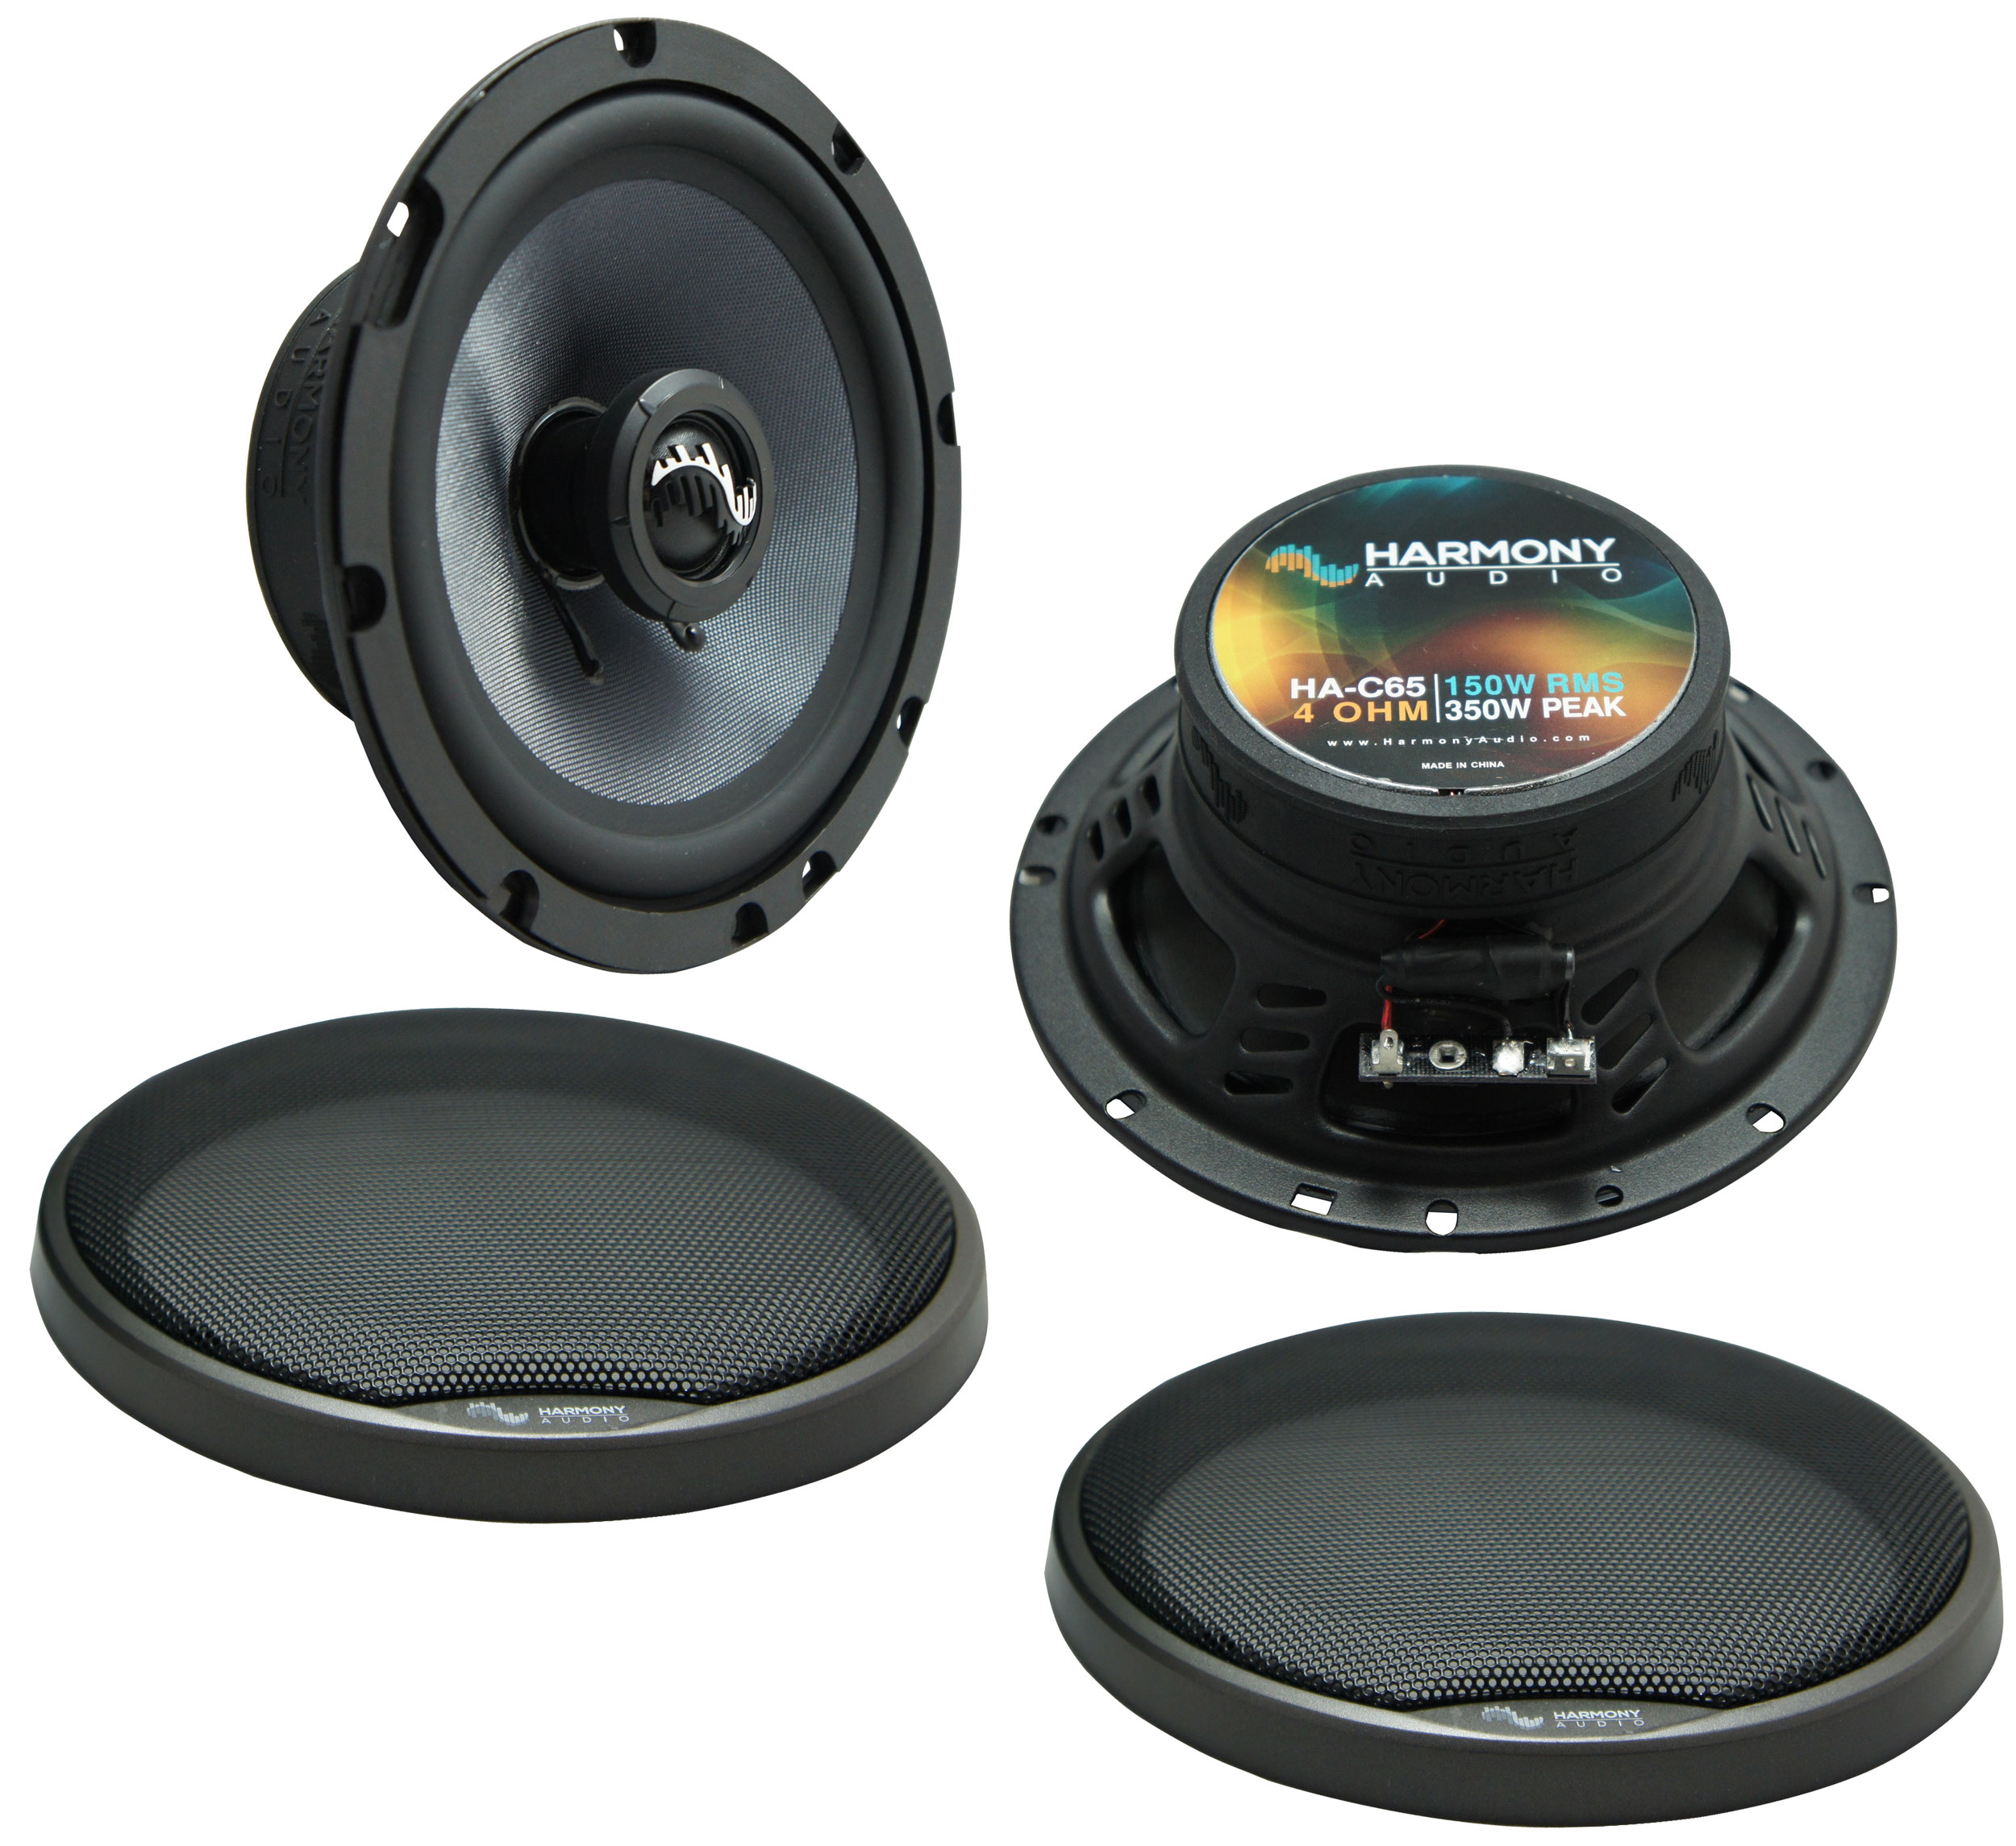 Fits Geo Prizm 1993-1997 Rear Deck Replacement Speaker Harmony HA-C65 Premium Speakers